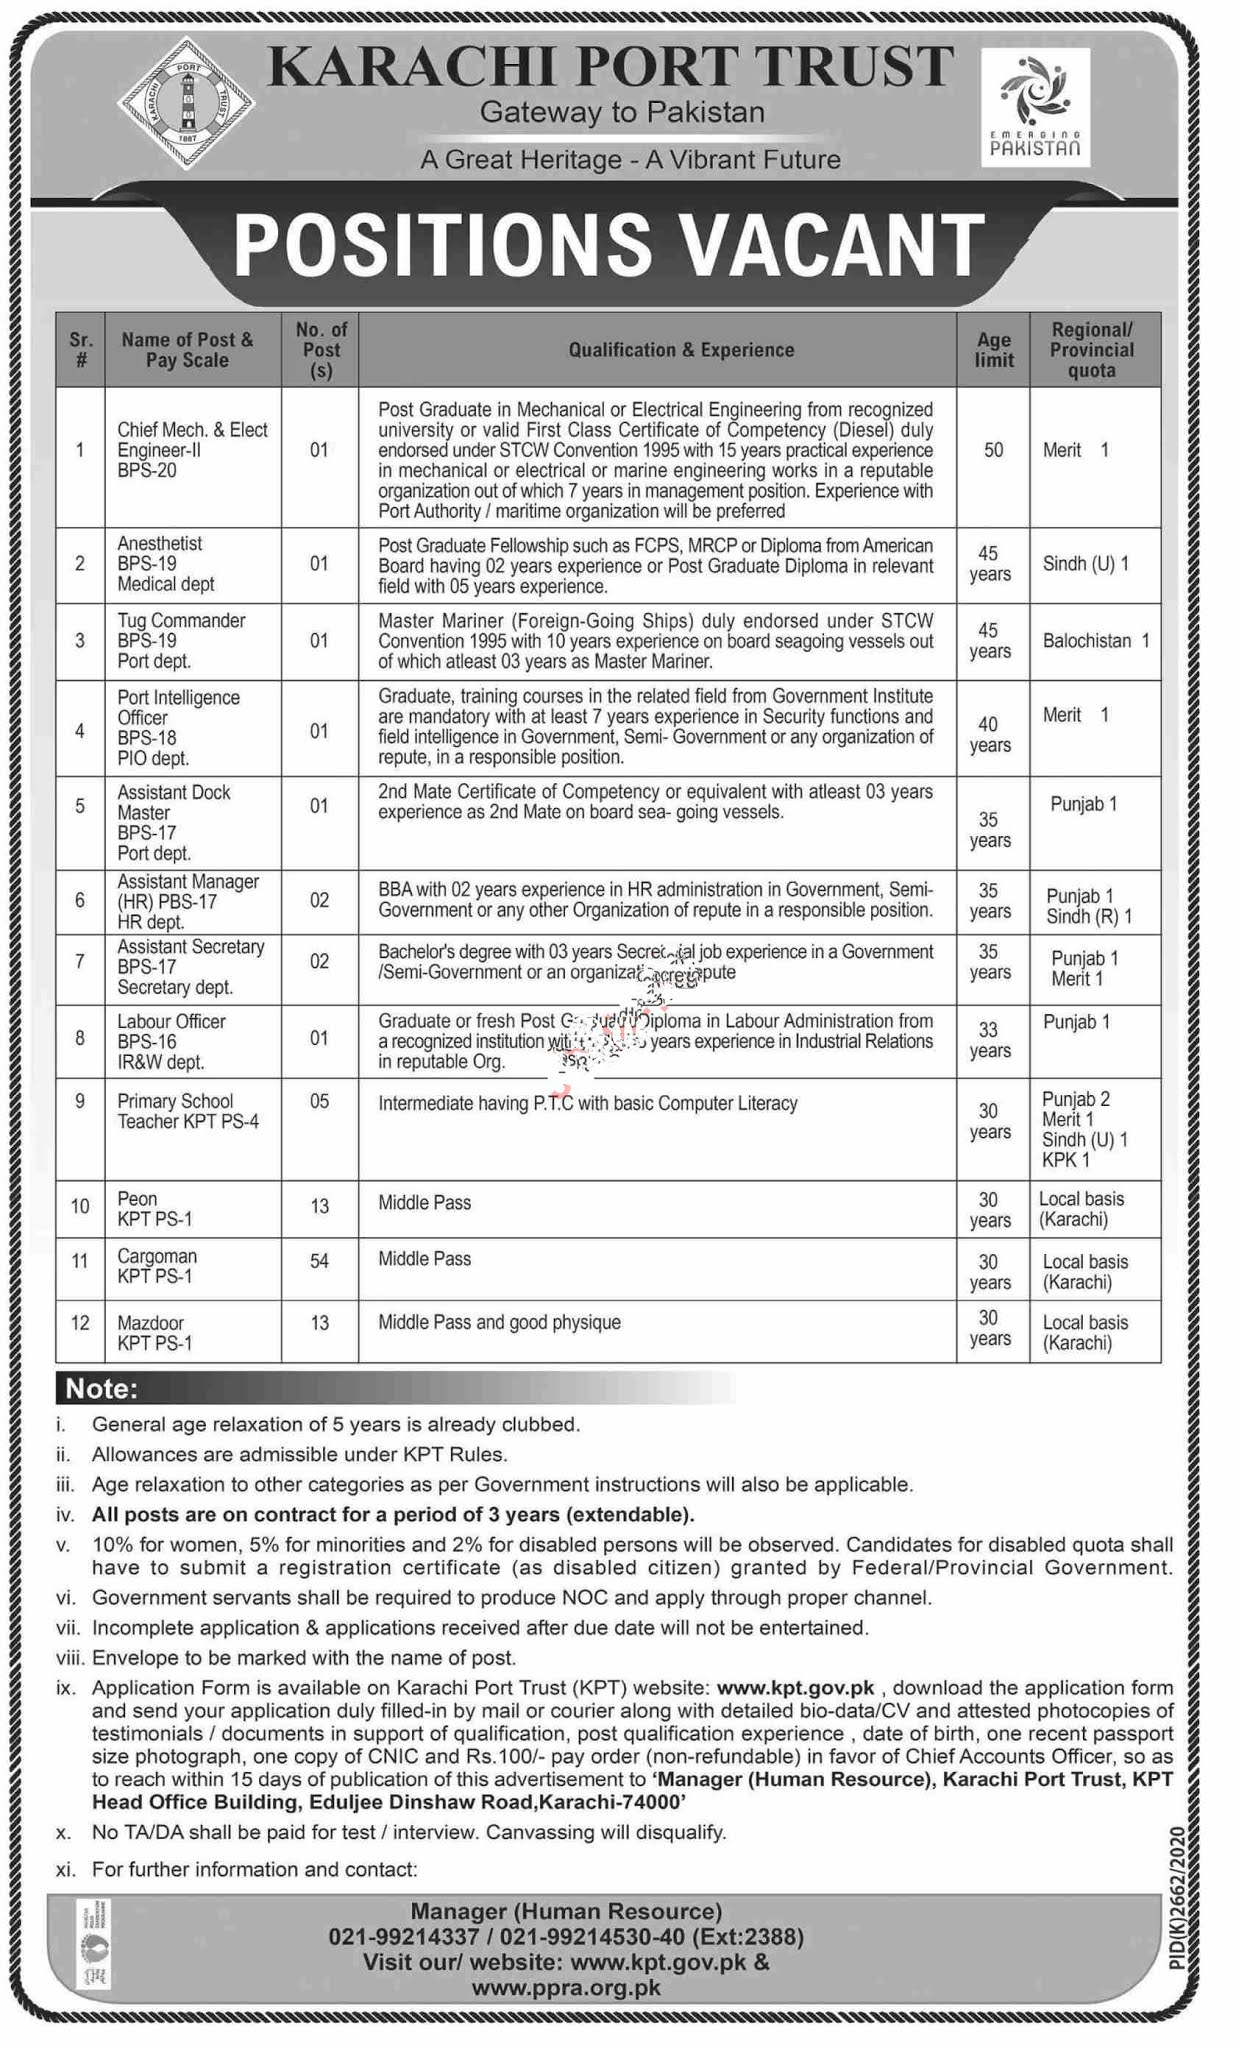 Karachi Port Trust KPT Karachi, Government of the Sindh Jobs 2021 For Tug Commander, Port Intelligence Officer, Assistant Dock Master, Assistant Manager, Assistant Manager HR, Assistant & more